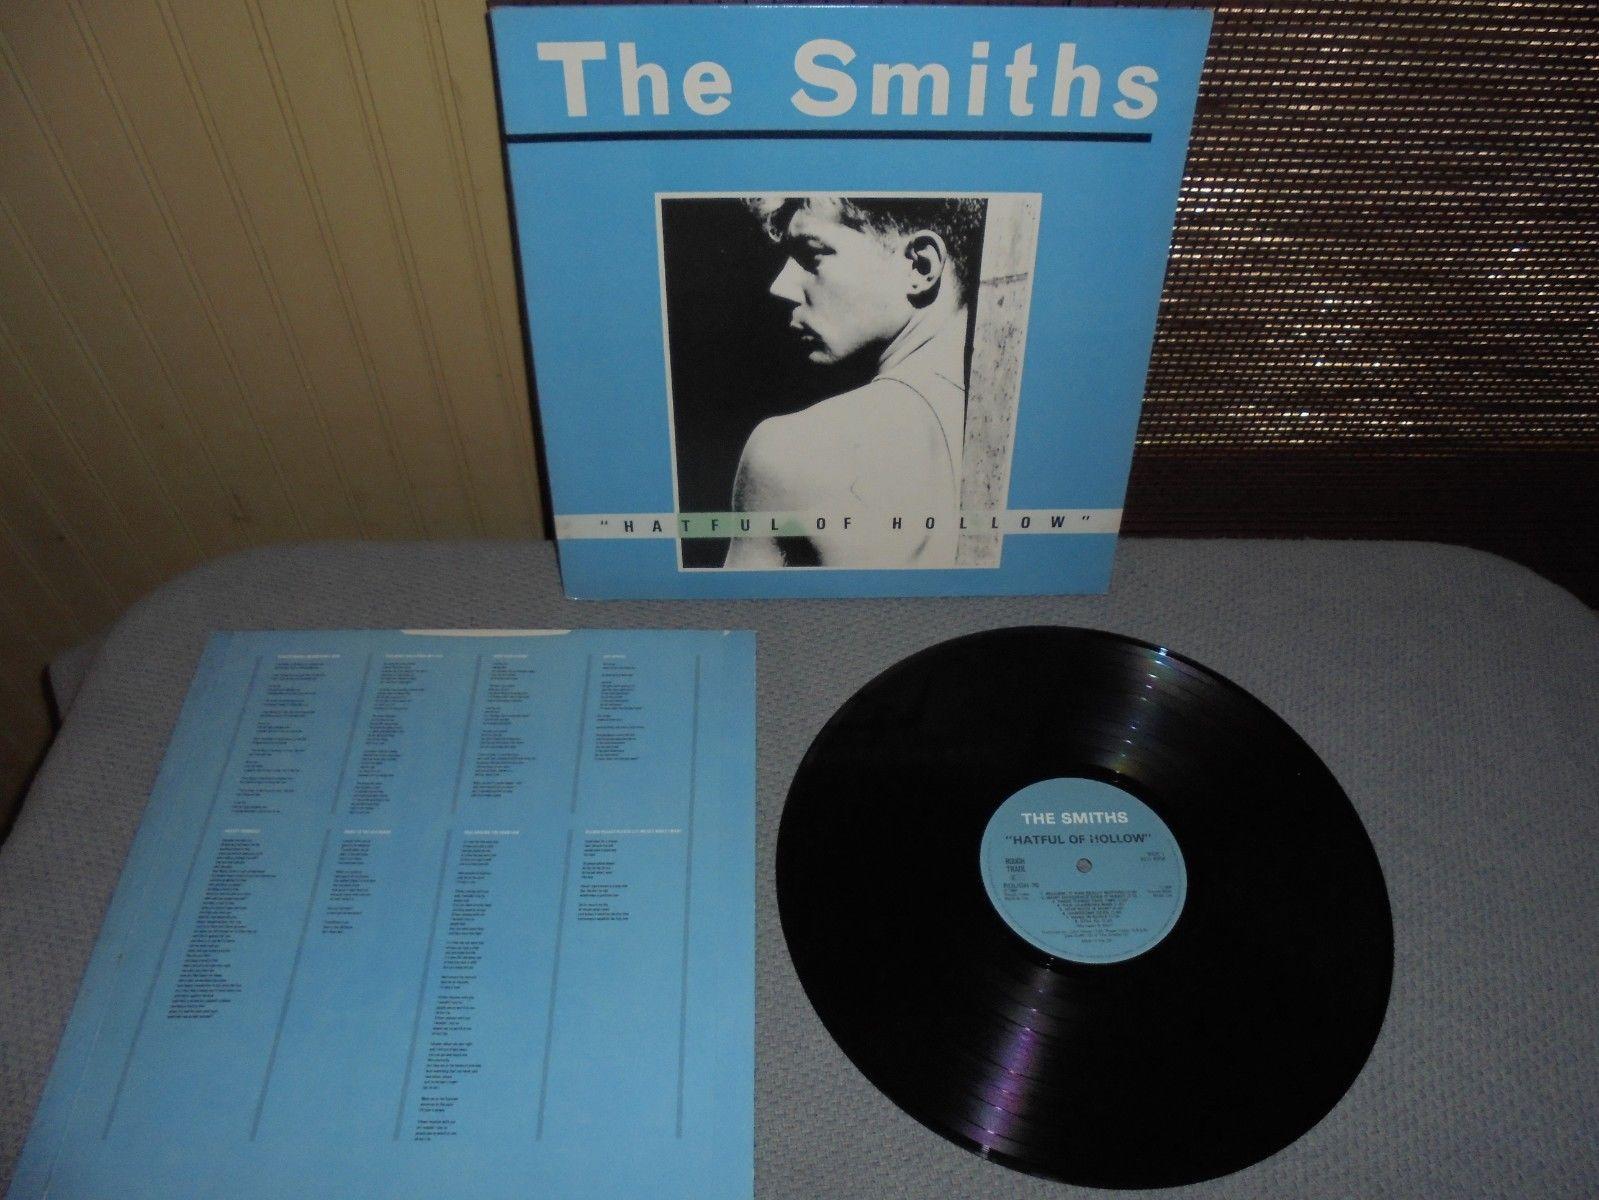 "The Smiths ""Hateful Of Hollow"" 1984 (Rough Trade Rough 76) vinyl album"